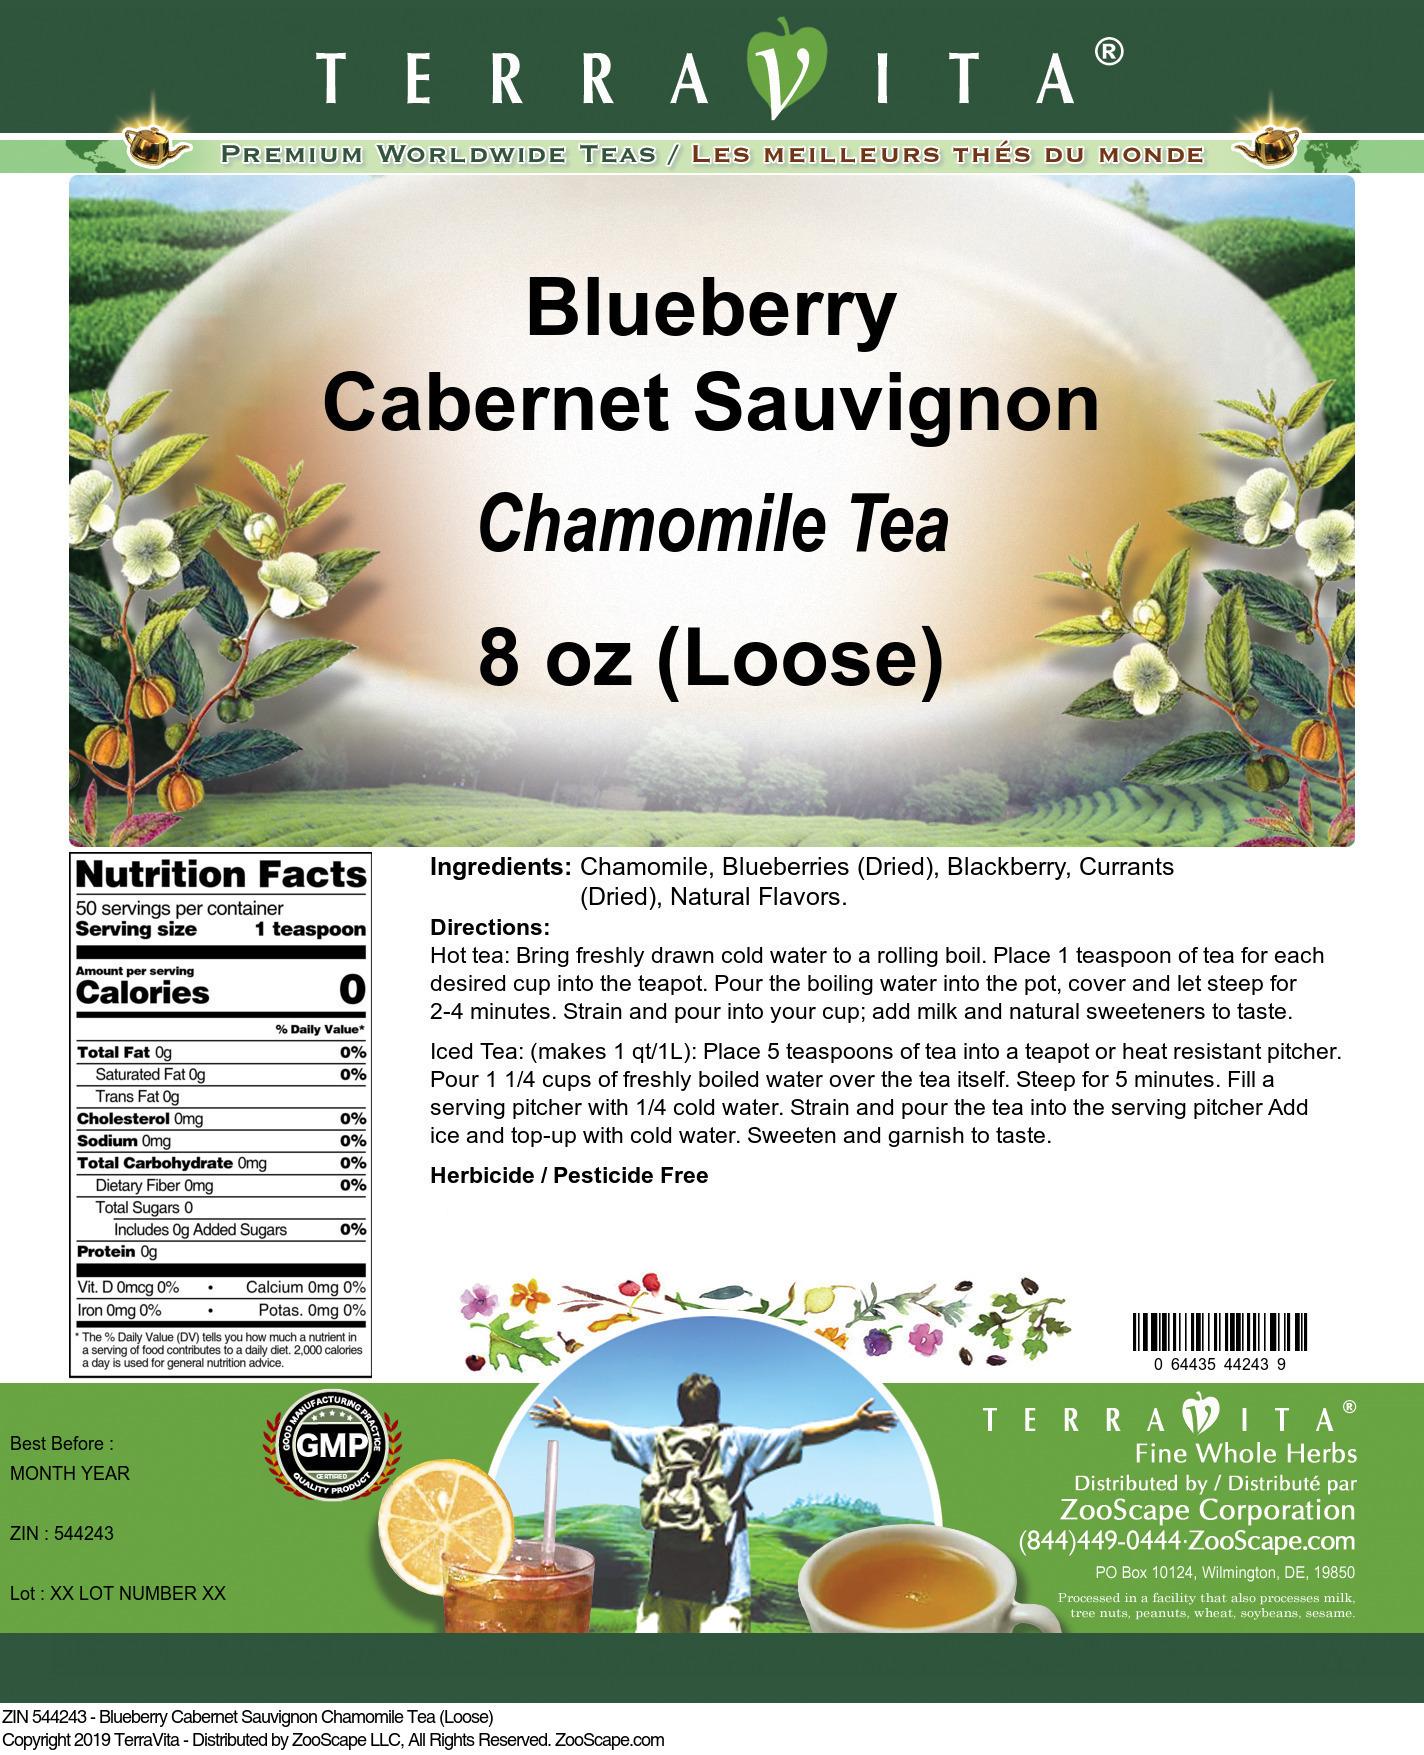 Blueberry Cabernet Sauvignon Chamomile Tea (Loose)